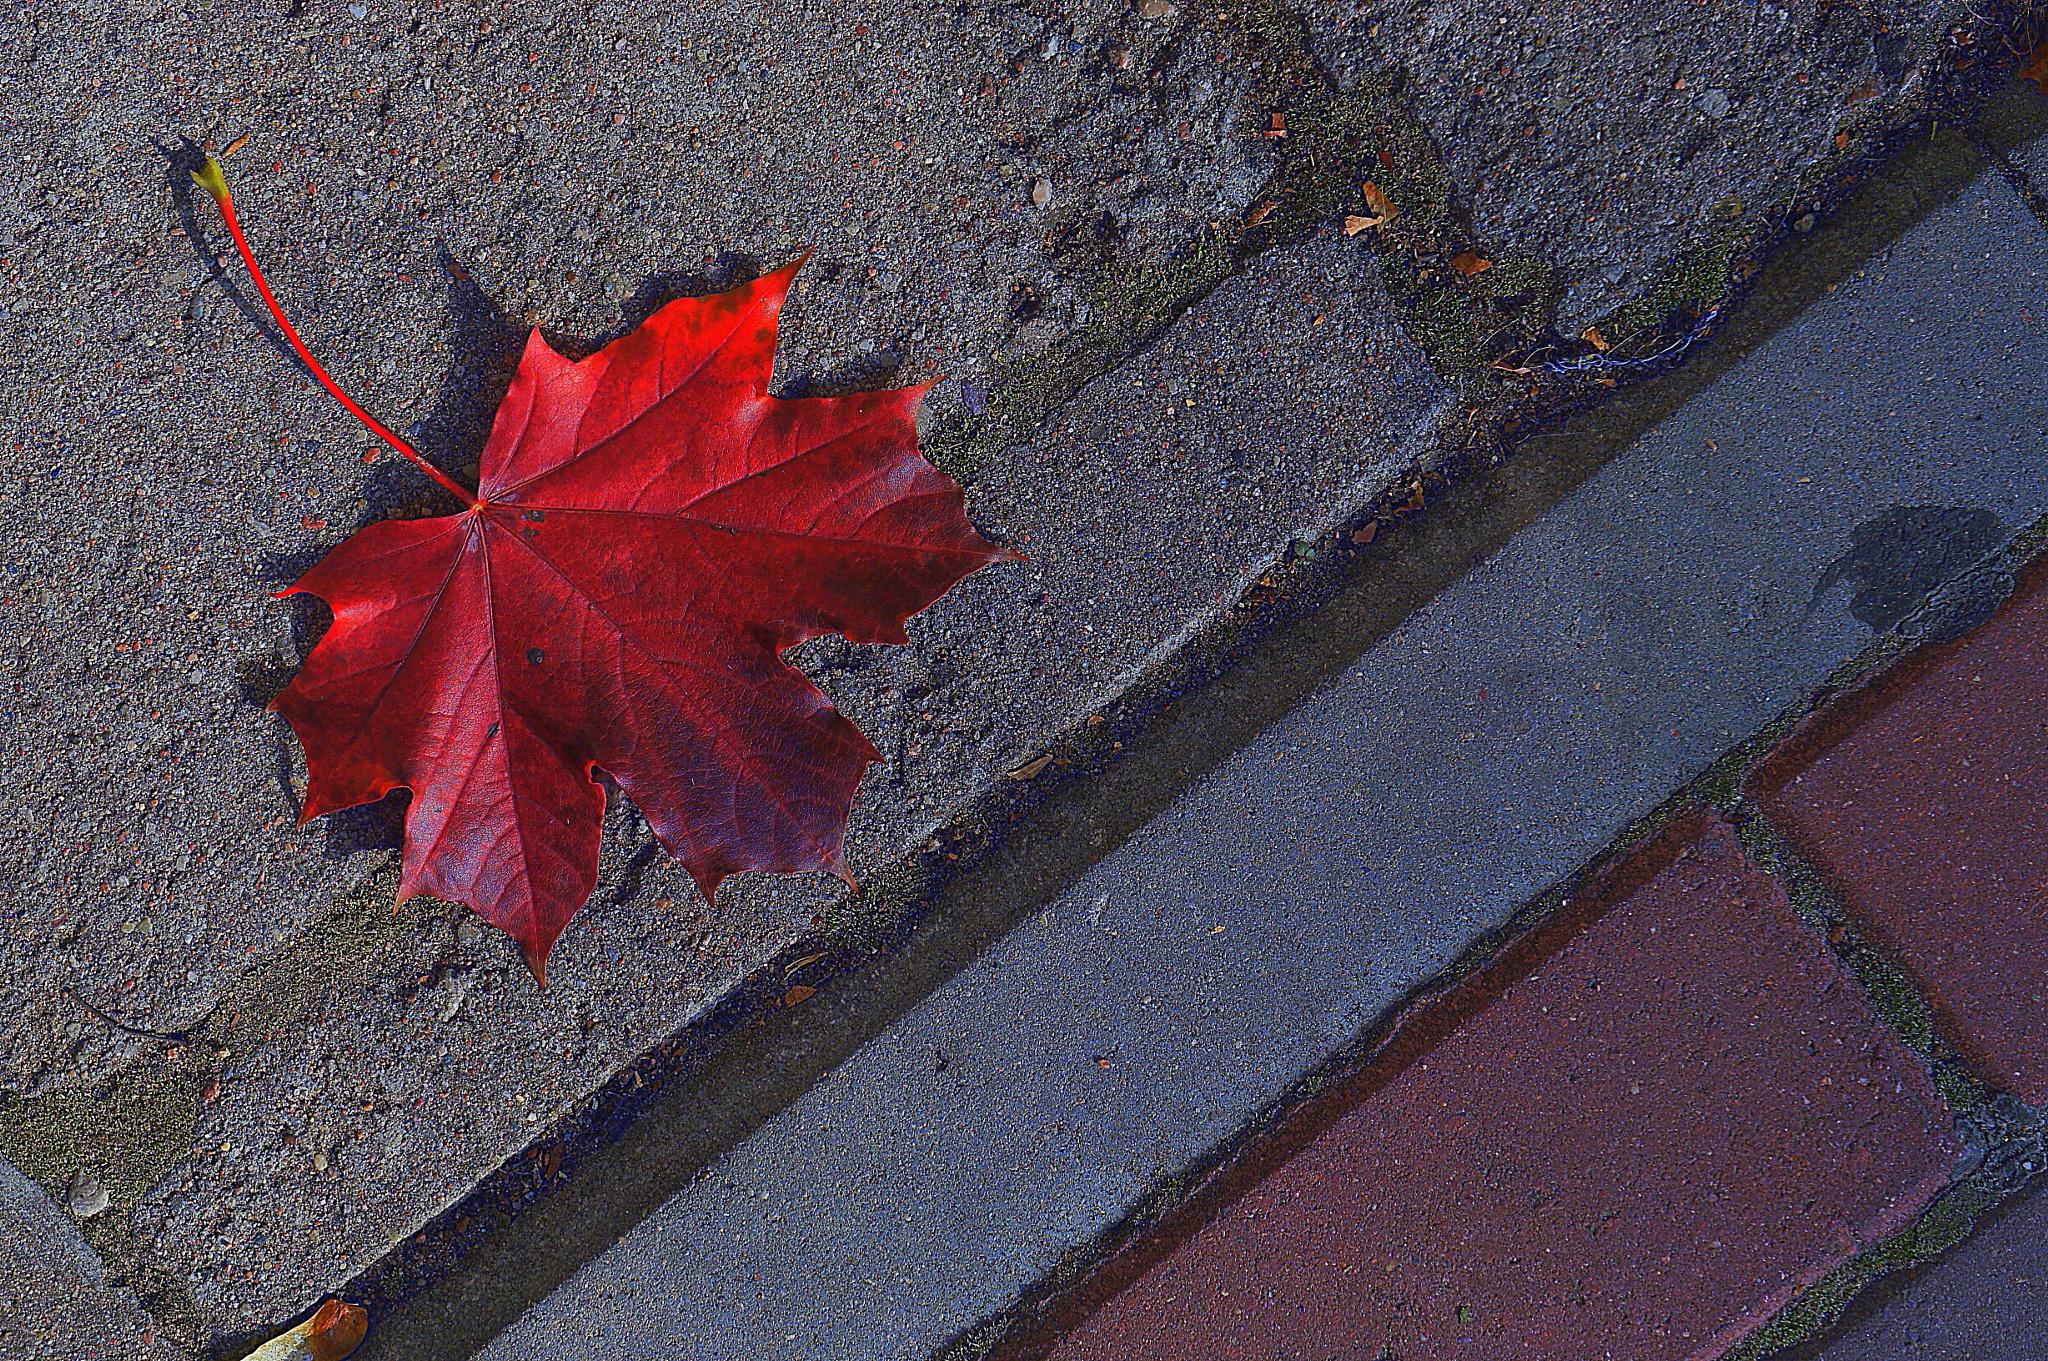 New Fall Collection by tania.skaradek